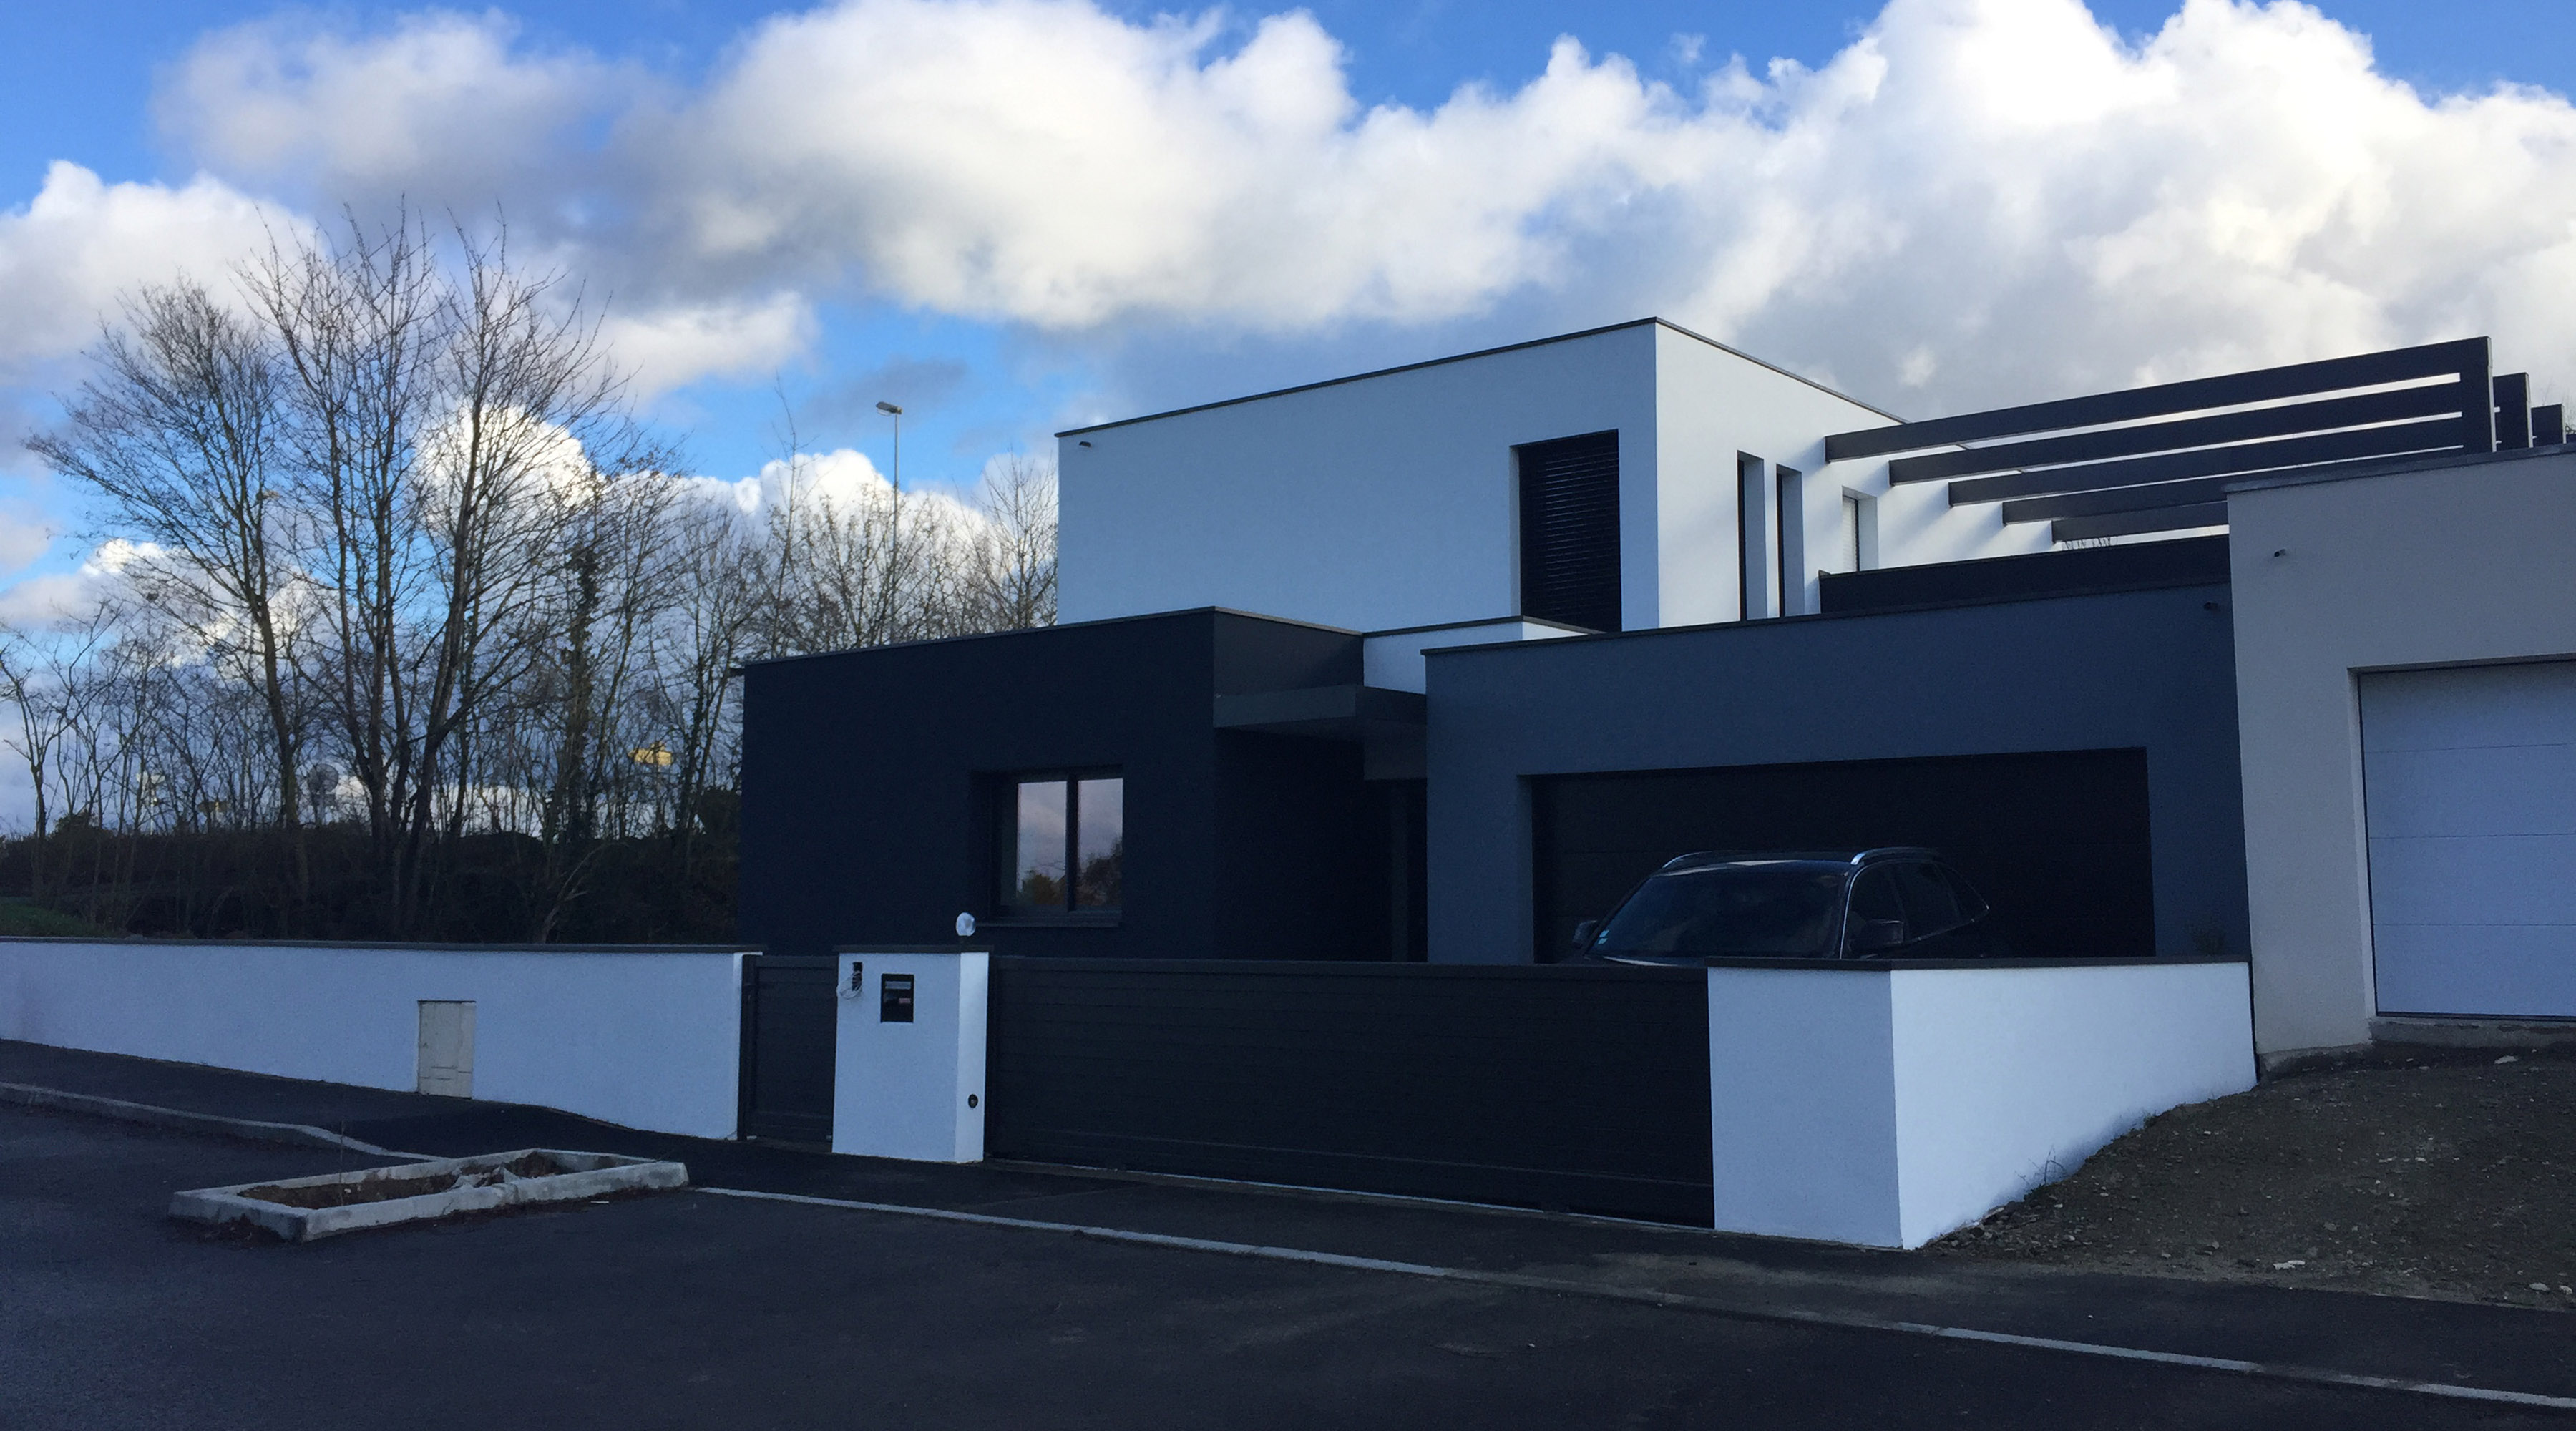 maison neuve architecte rennes 1 2 vue lise roturier. Black Bedroom Furniture Sets. Home Design Ideas